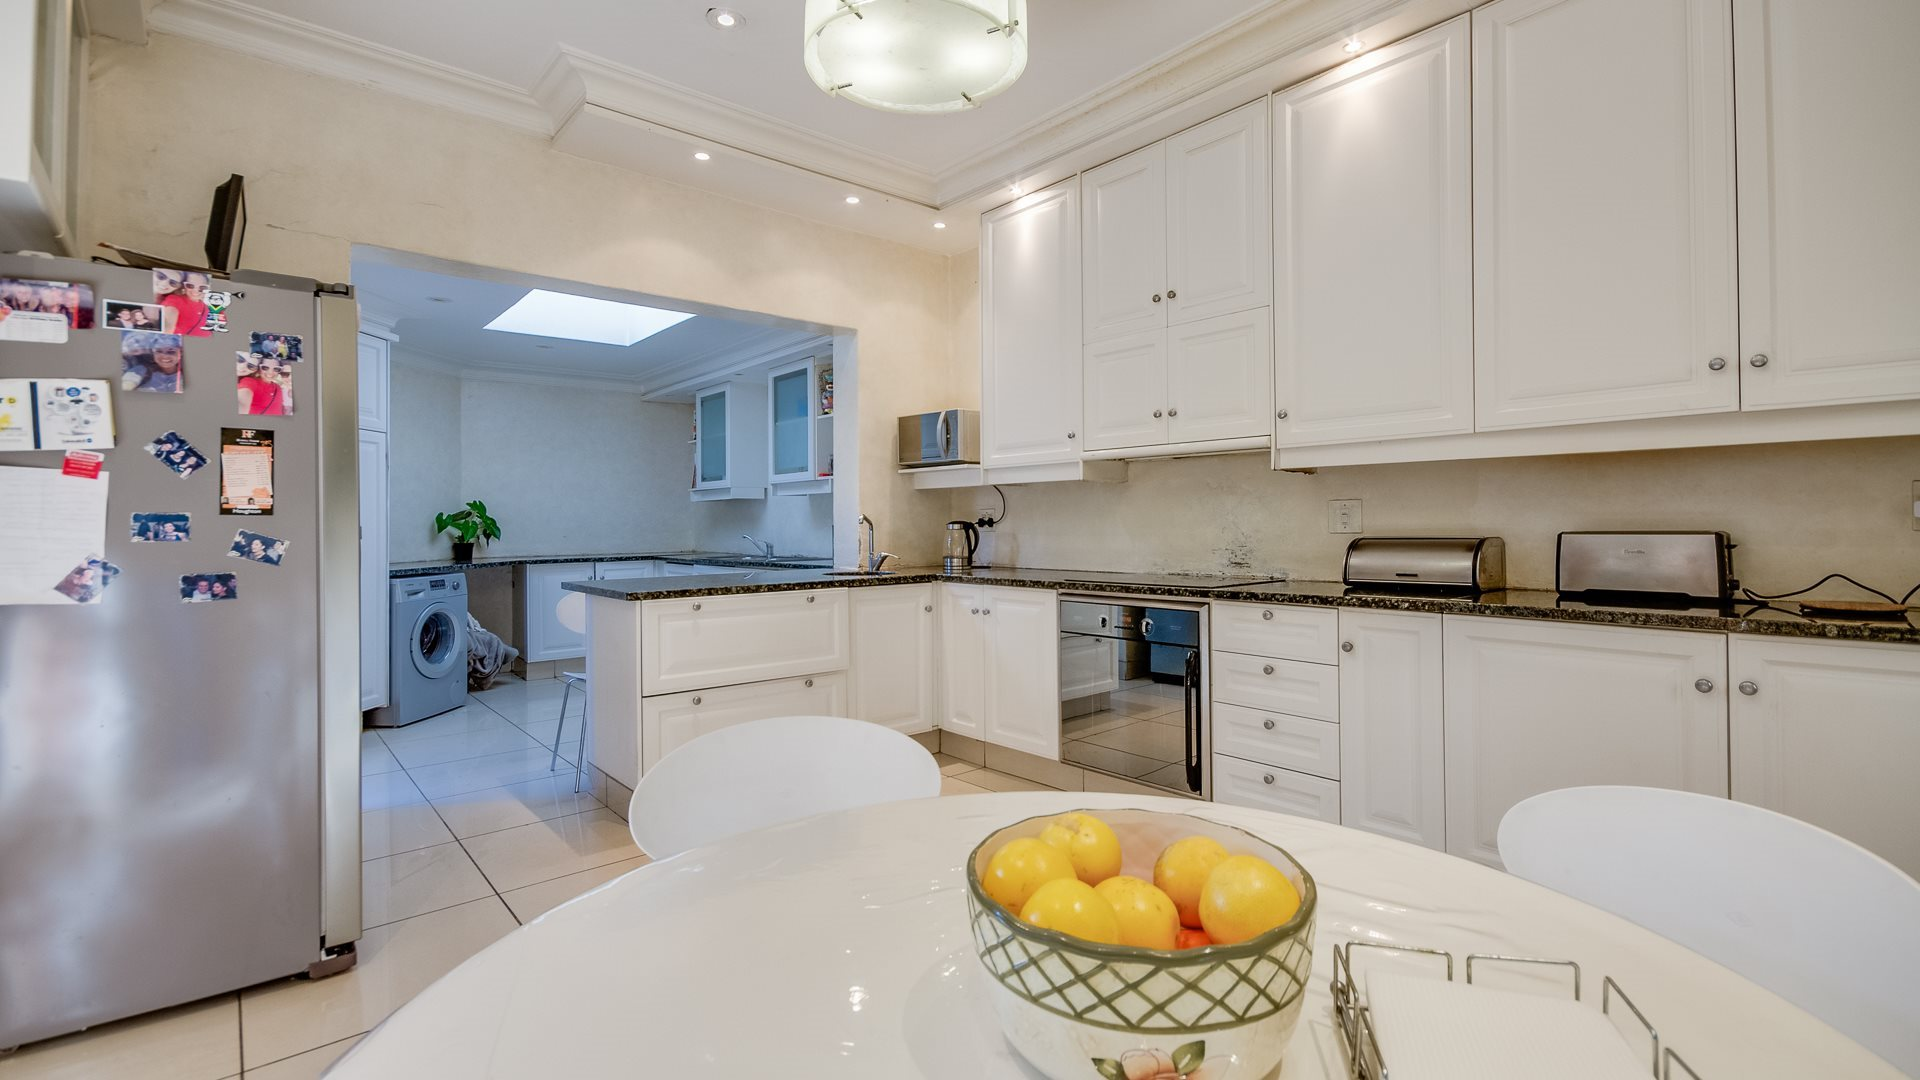 Houghton Estate property for sale. Ref No: 13527223. Picture no 4